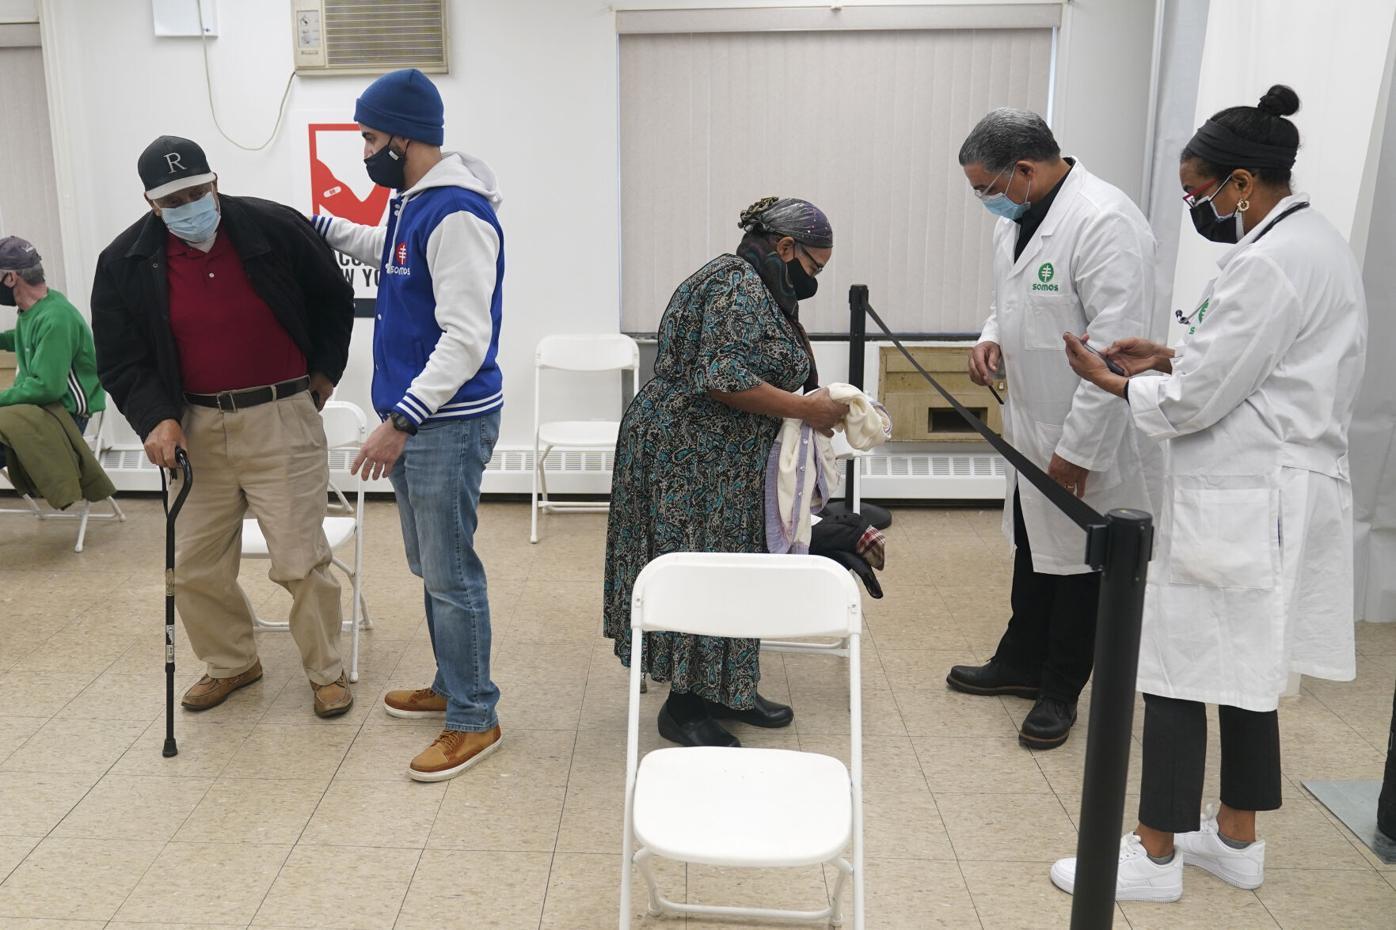 Virus Outbreak Latinos Vaccinations